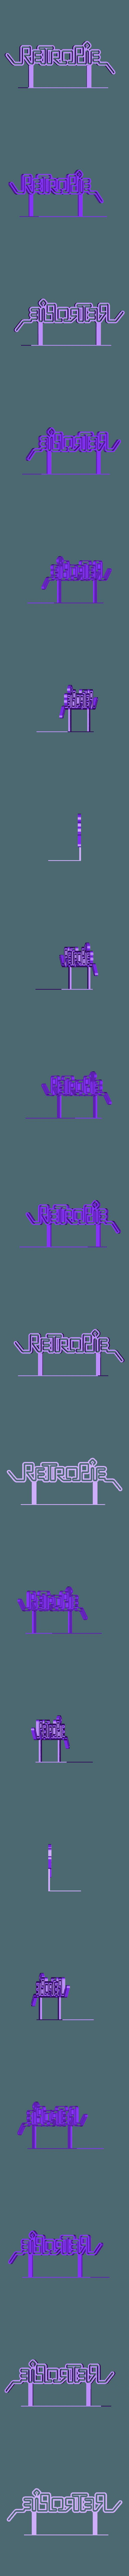 REtro-Pi-Logo-Stand.stl Download free STL file RetroPi Logo • 3D printing model, AwesomeA